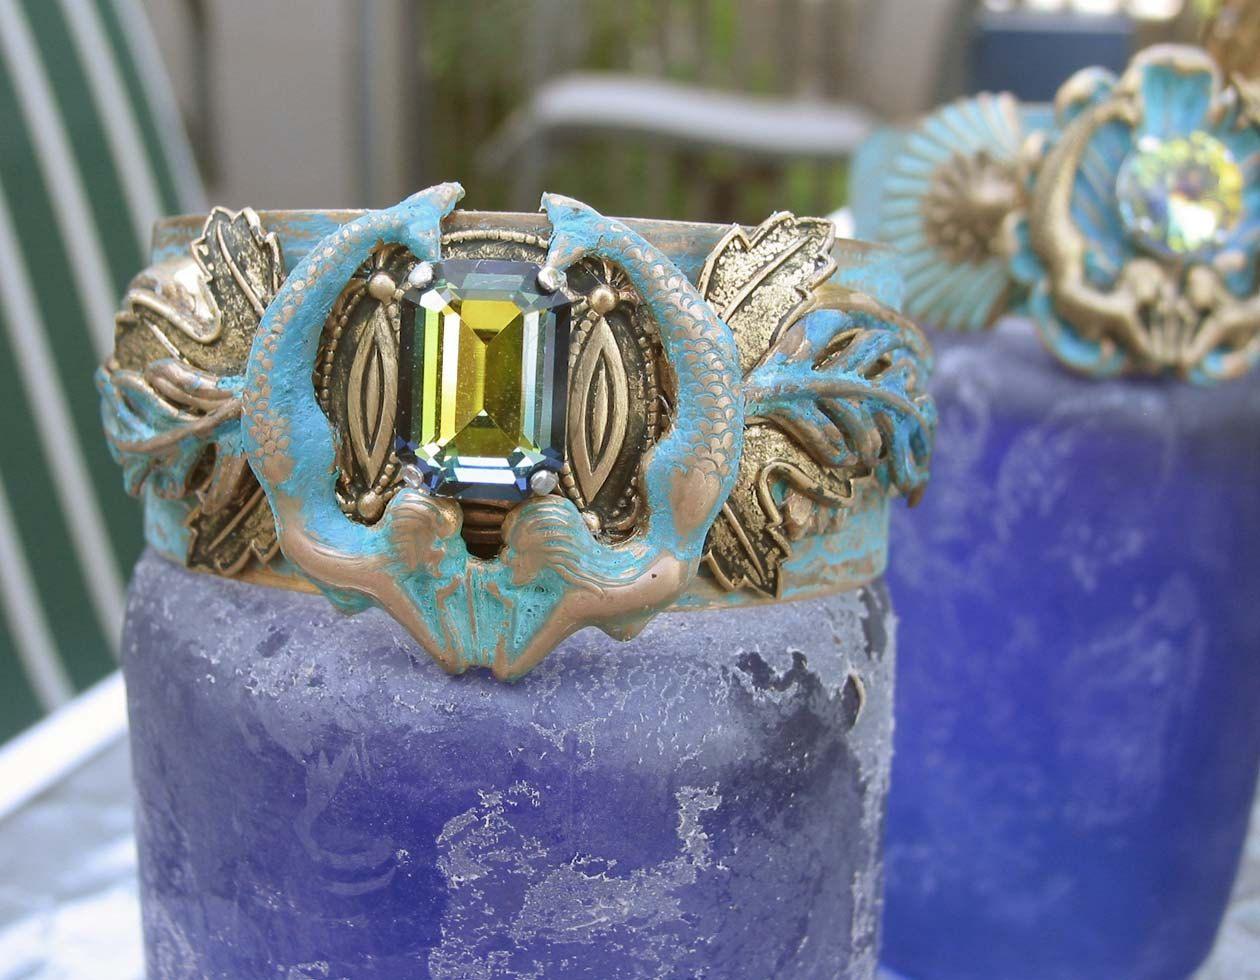 Verdgris Patina Mermaid with Vintage Sahara Swarovski Crystal brass Cuff by steamheat on Etsy